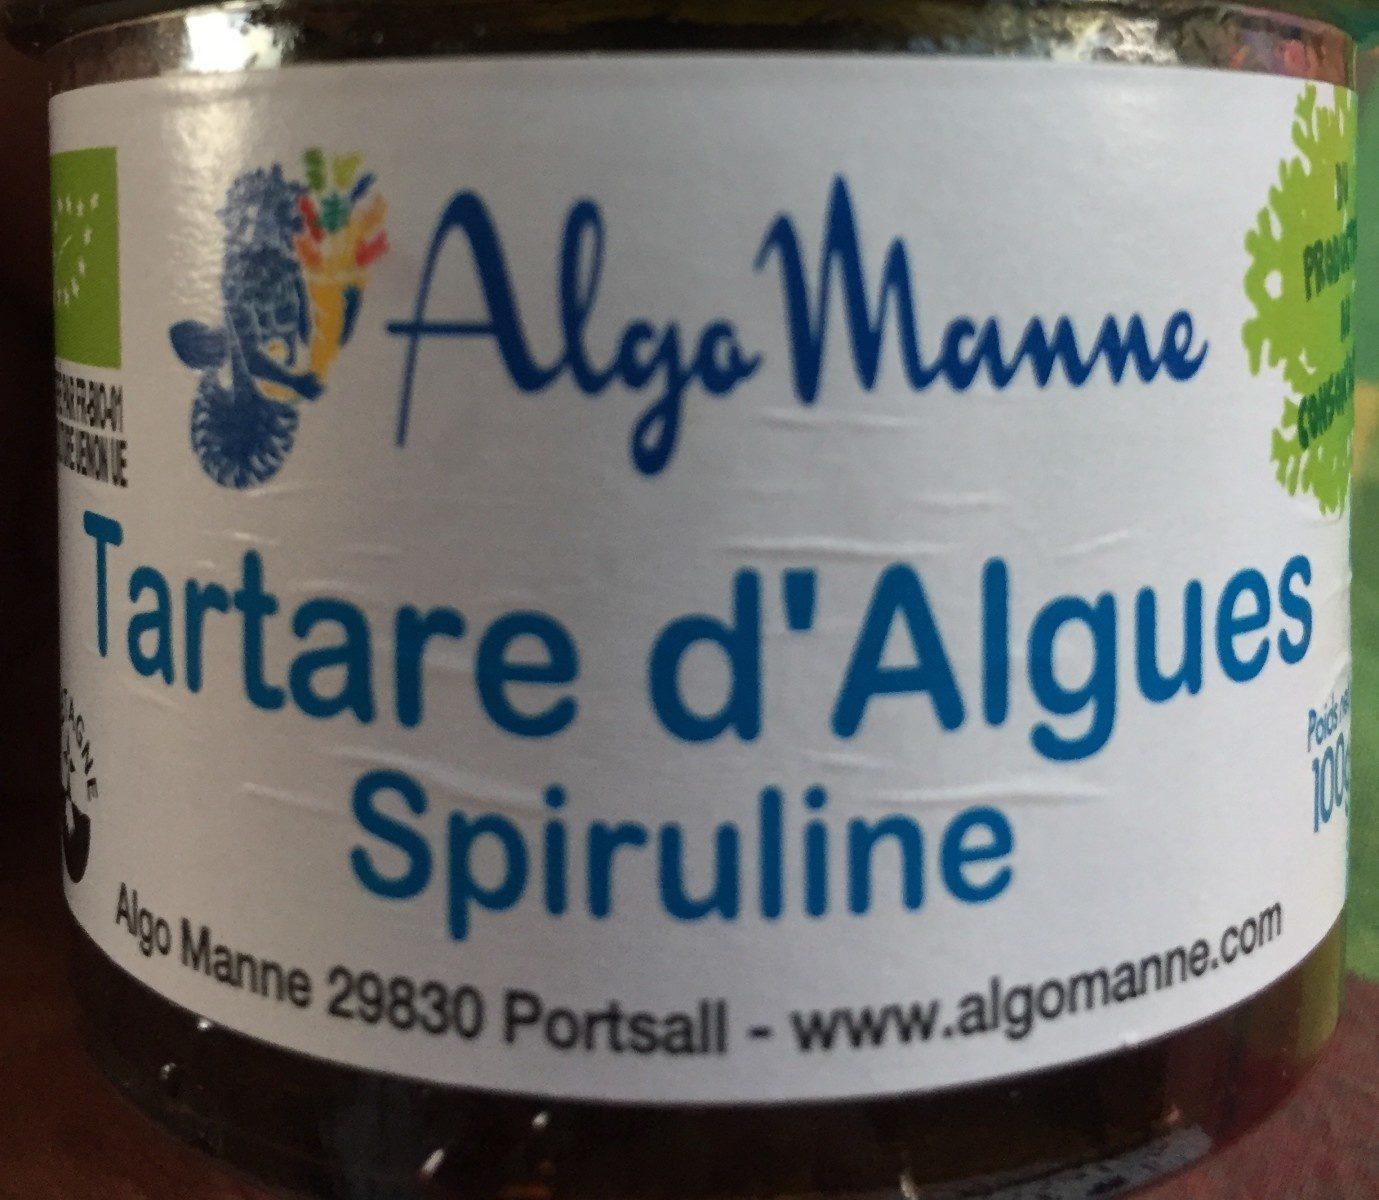 Tartare d'algues Spiruline - Product